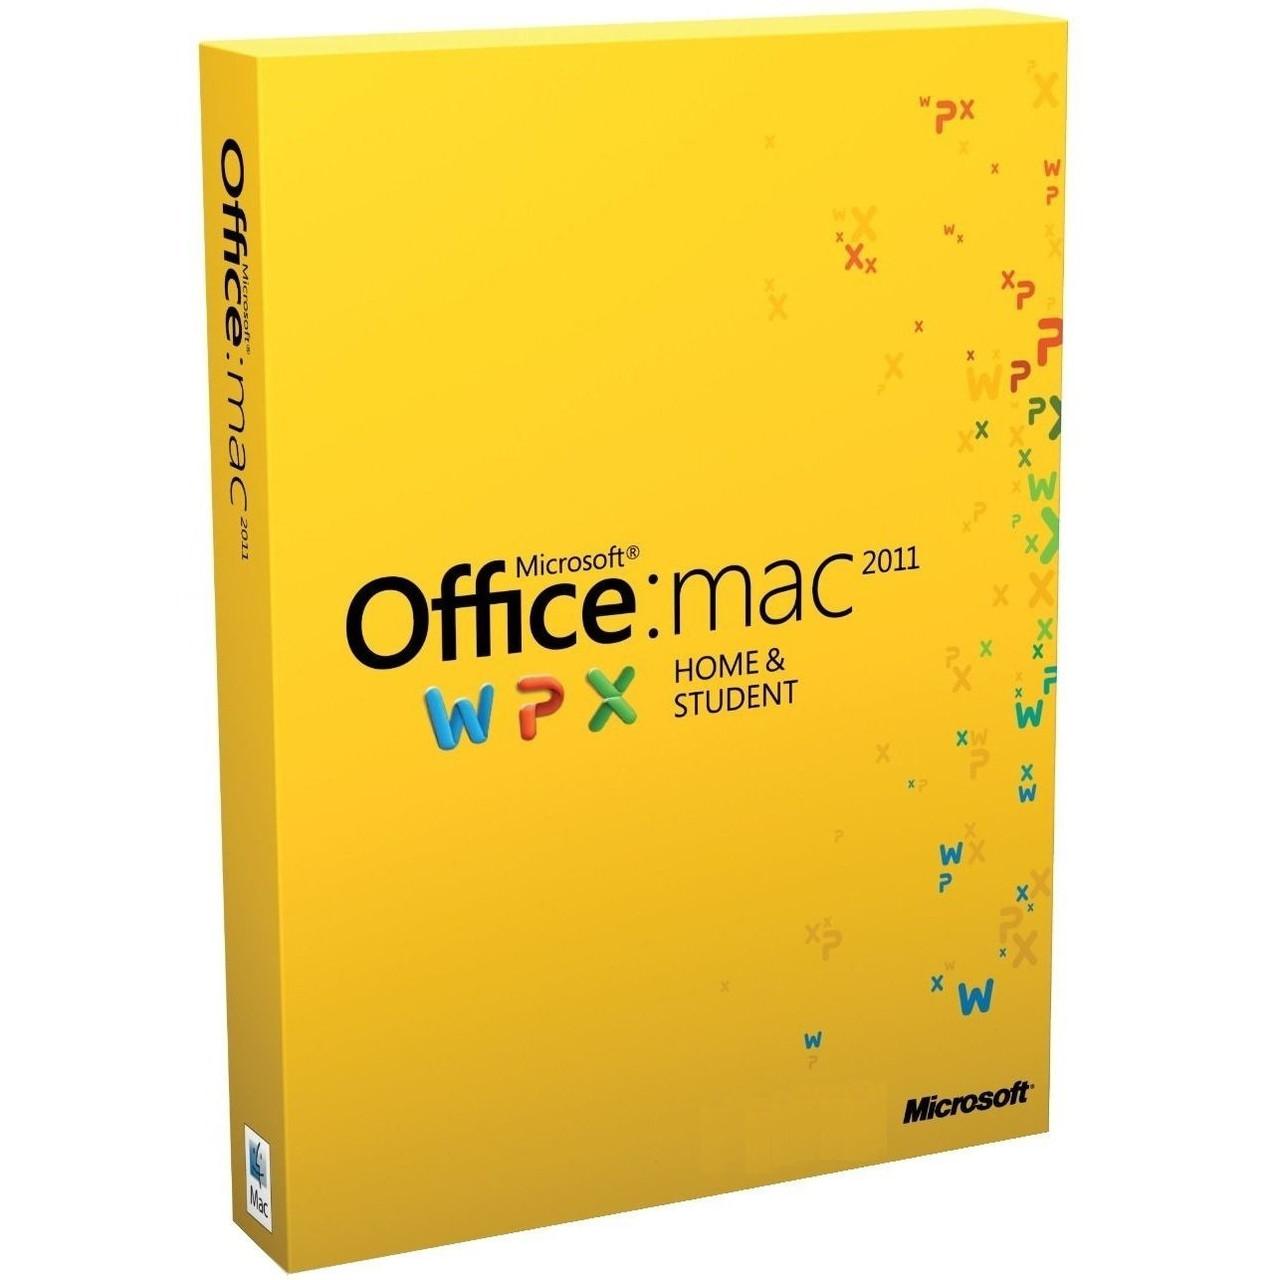 Microsoft Office Mac Home Student FamilyPK 2011 Russian DVD BOX (W7F-00022)